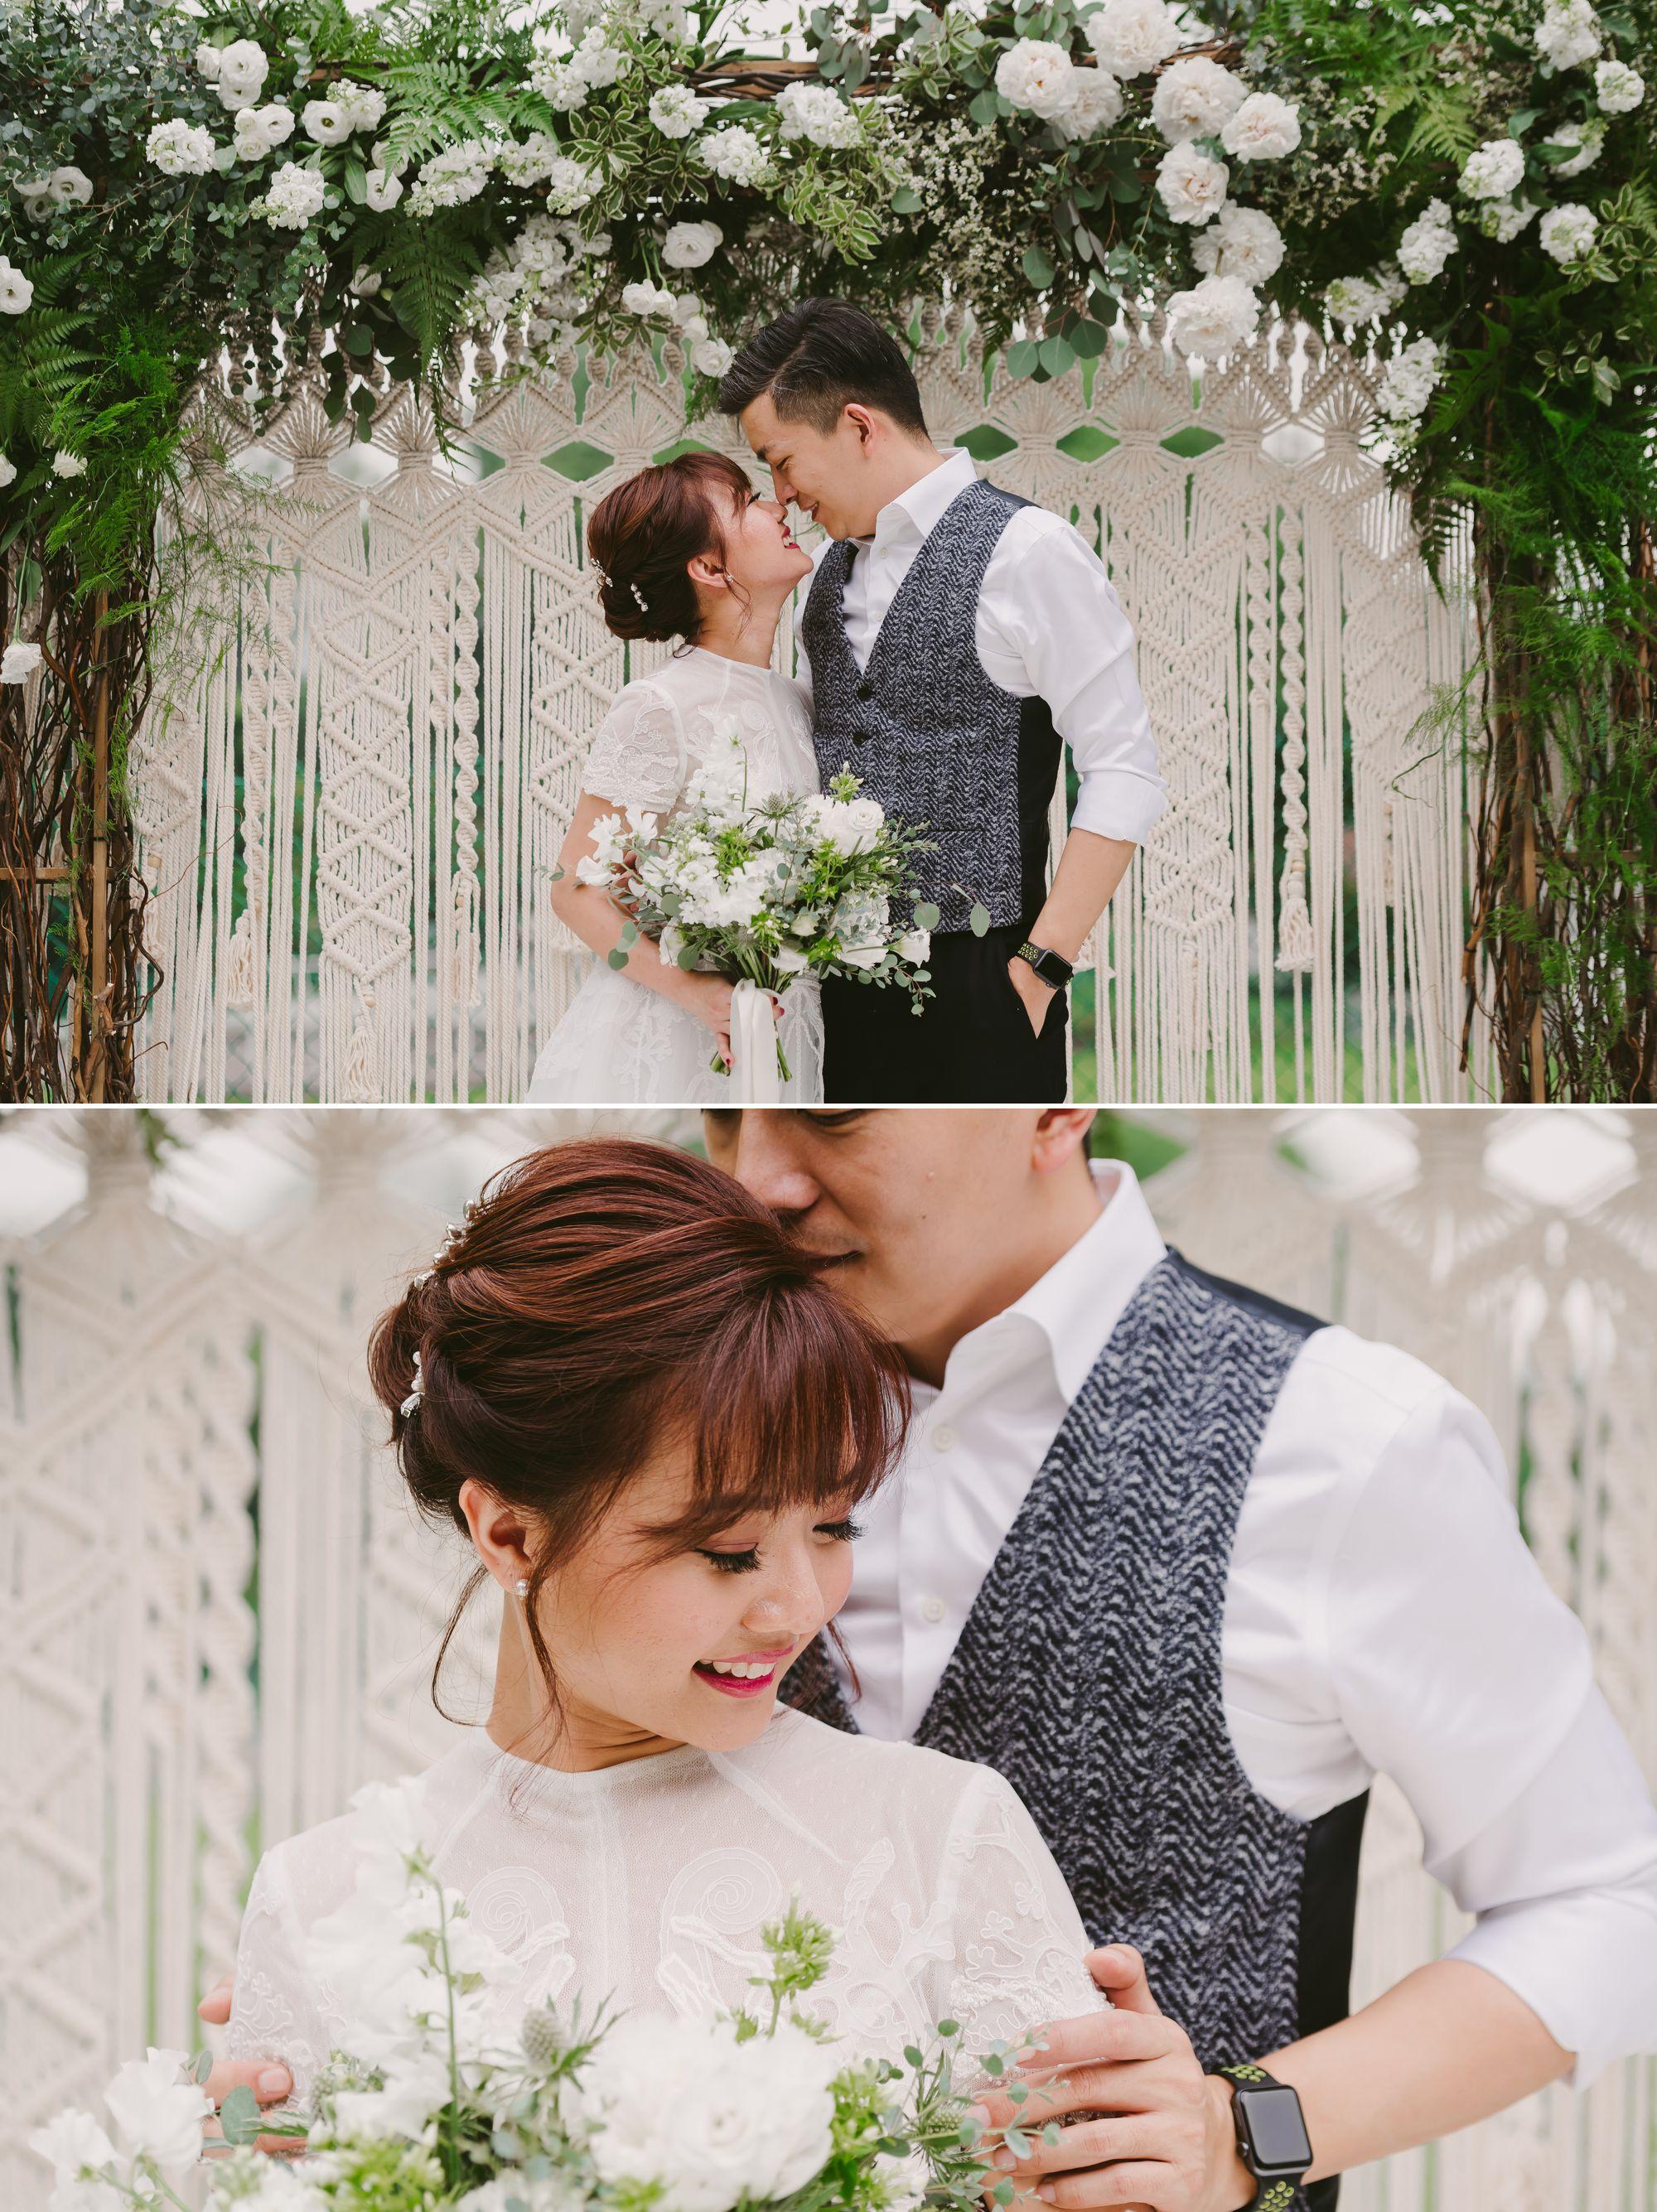 wedding_photography 23.jpg